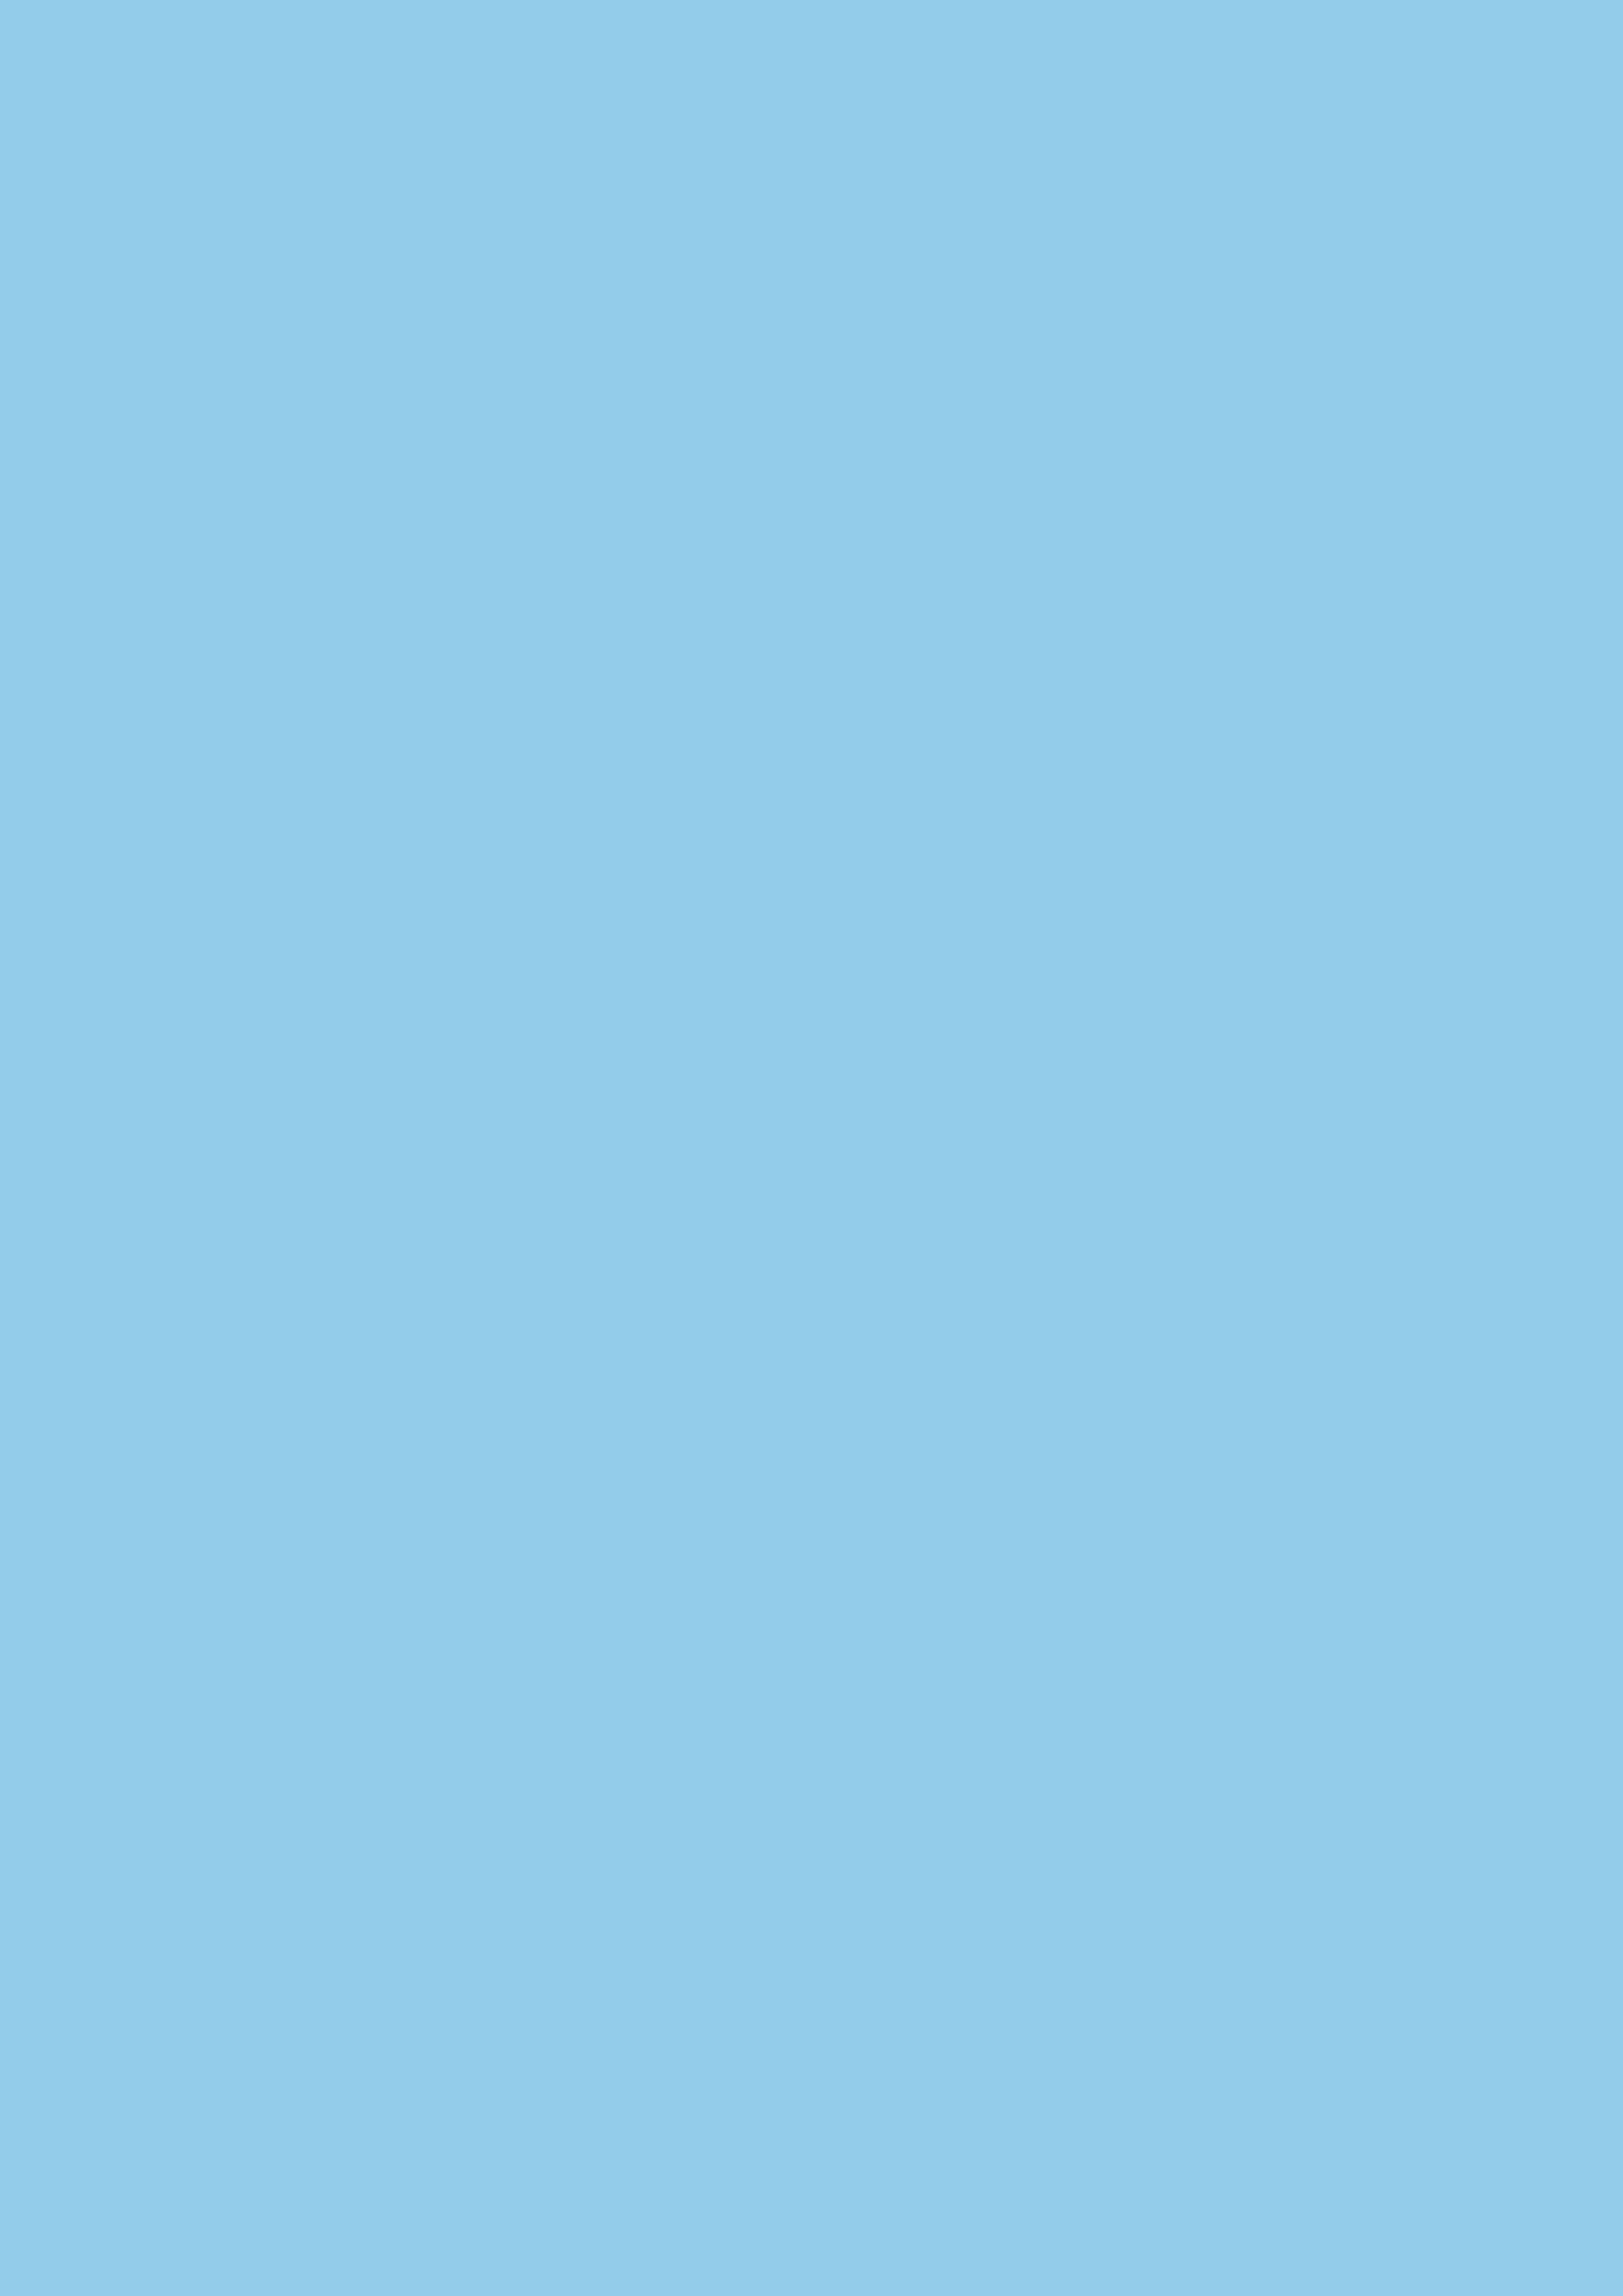 2480x3508 Light Cornflower Blue Solid Color Background